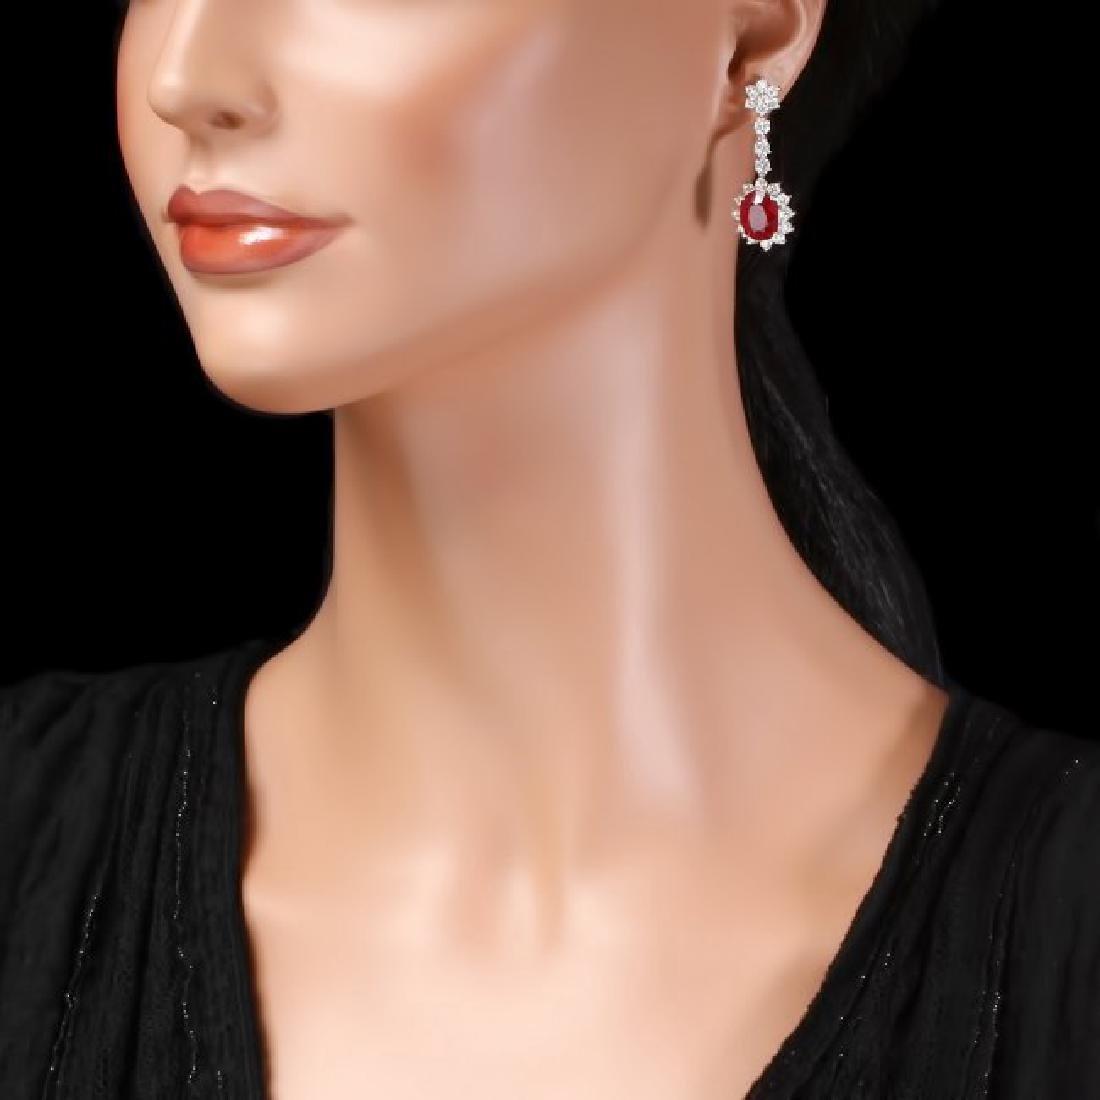 14k Gold 10.00ct Ruby 3.90ct Diamond Earrings - 3